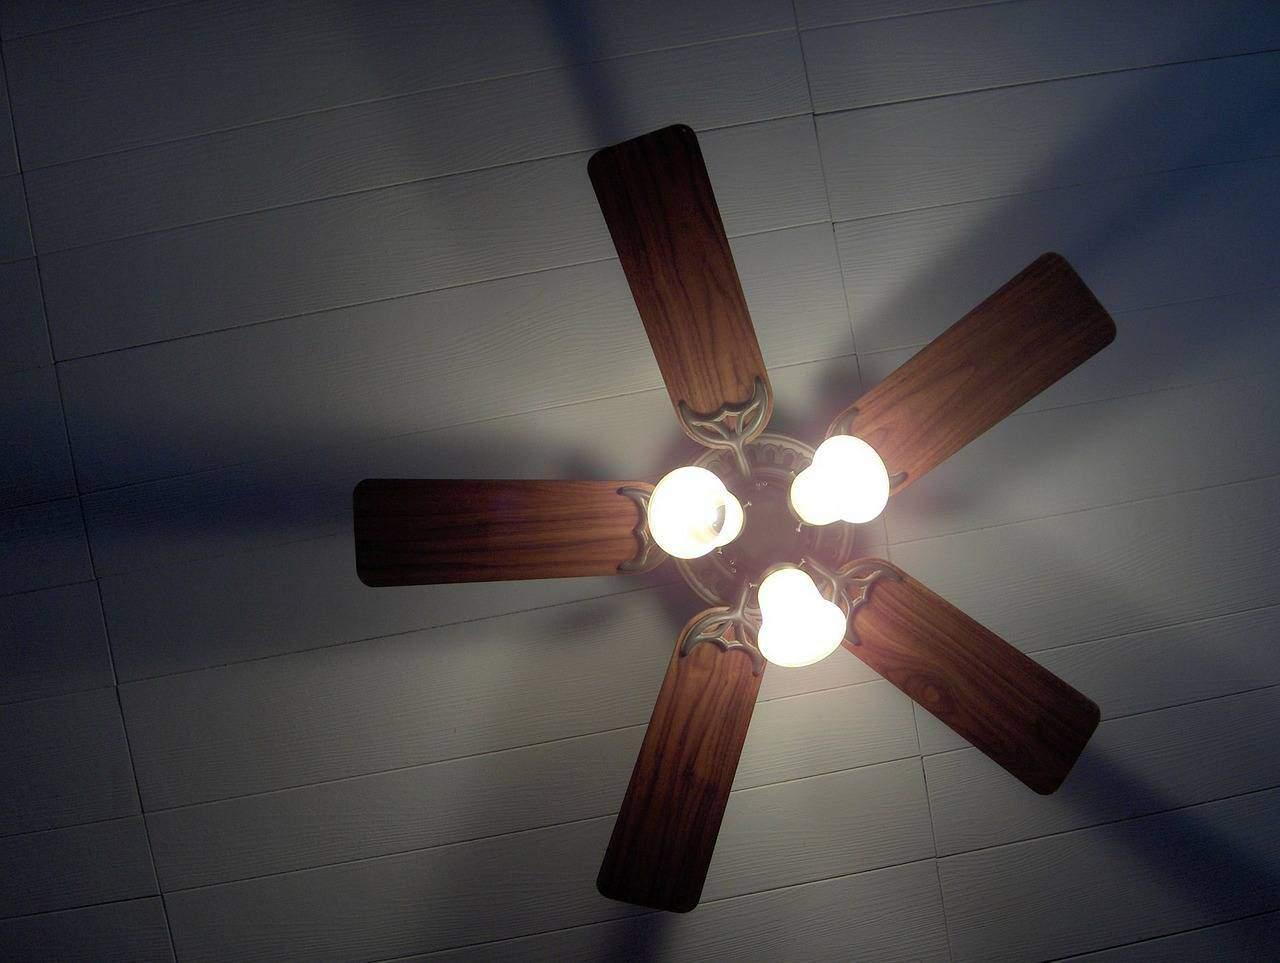 home appliance for air circulation